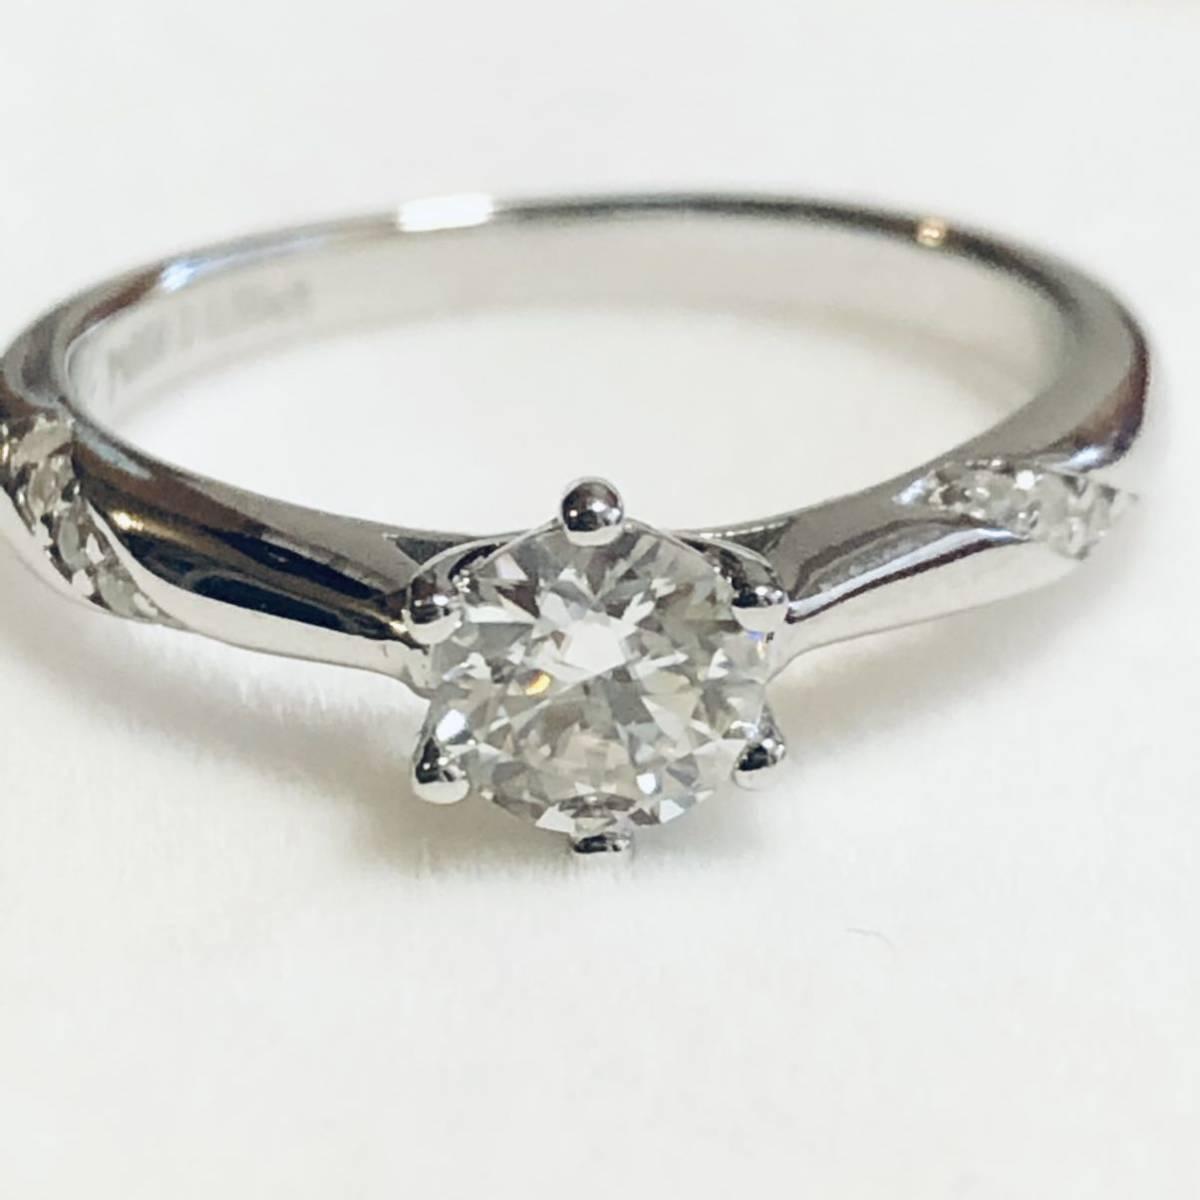 pt950 D0.50ct プラチナ ダイヤモンドリング 約12号 1円スタート アクセサリー ジュエリー 指輪